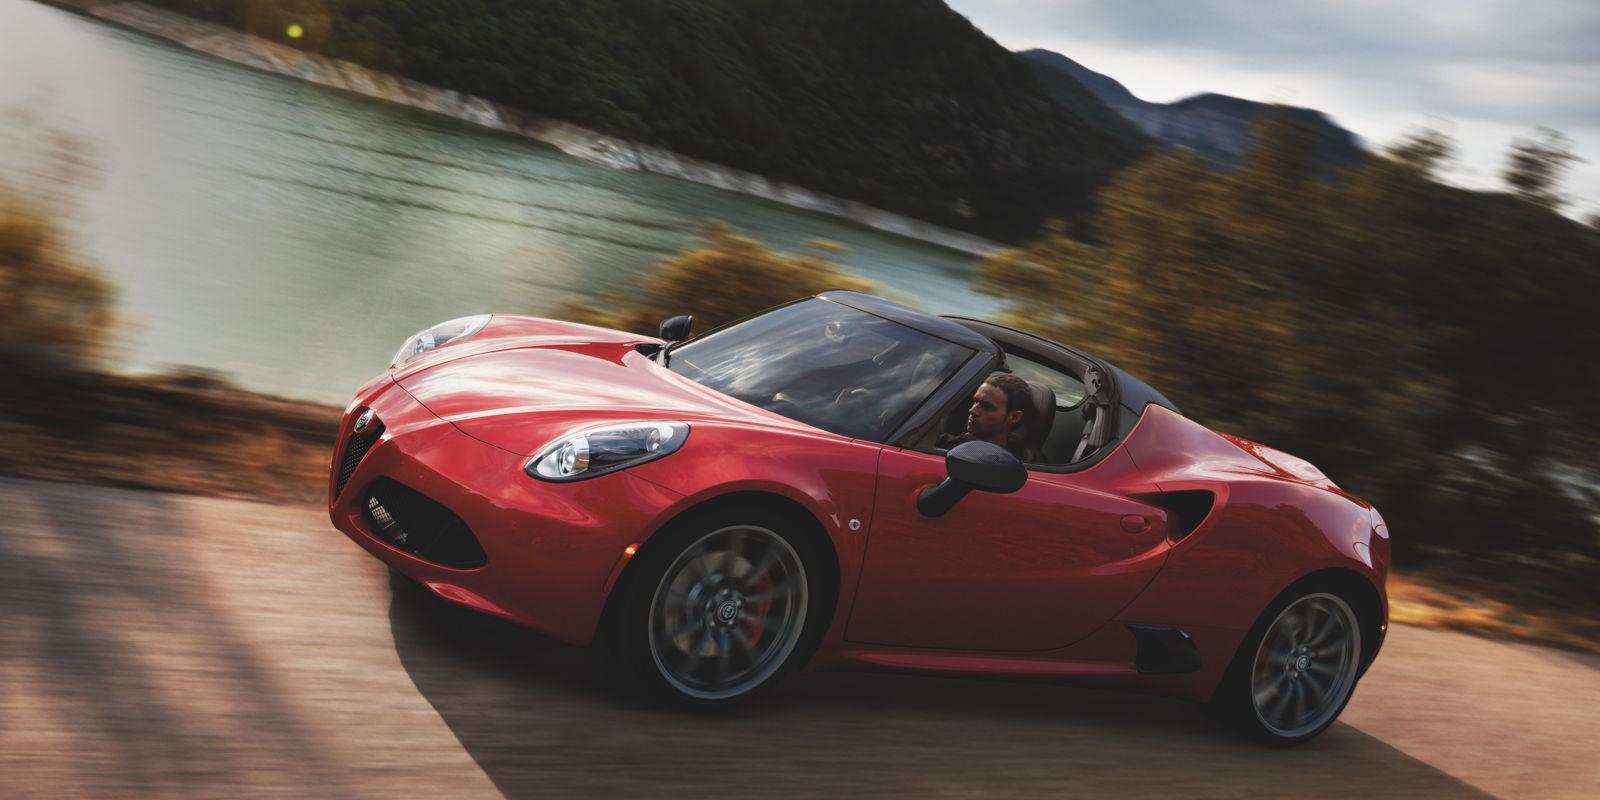 Alfa Romeo C Spider Lease Incentives Florence KY - Alfa romeo 4c leasing